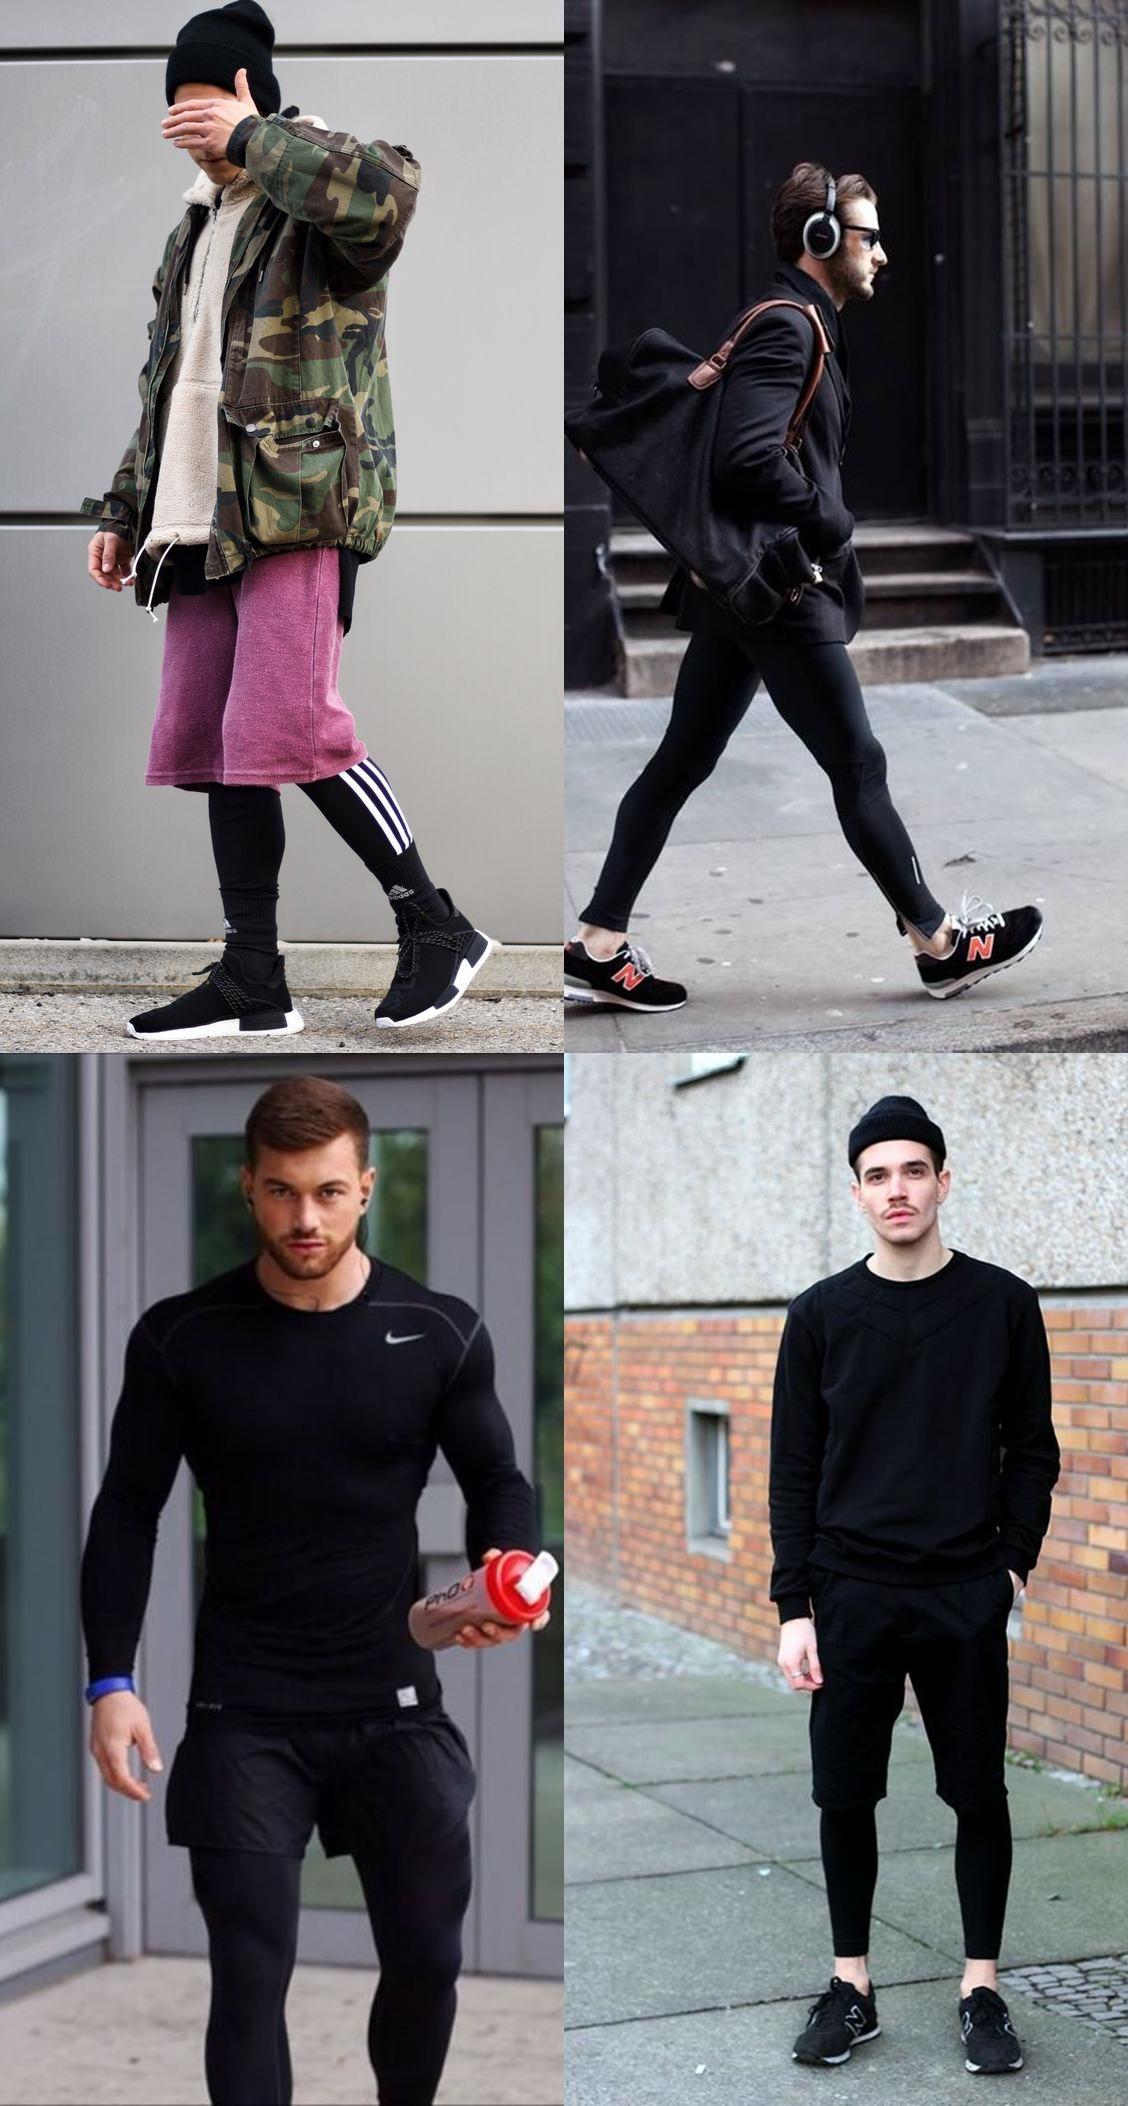 calça masculina 2017, jogger masculina, capri masculina, legging masculina, jeans destroyed masculino, blog de moda masculina, alex cursino, moda sem censura, menswear, dicas de moda,